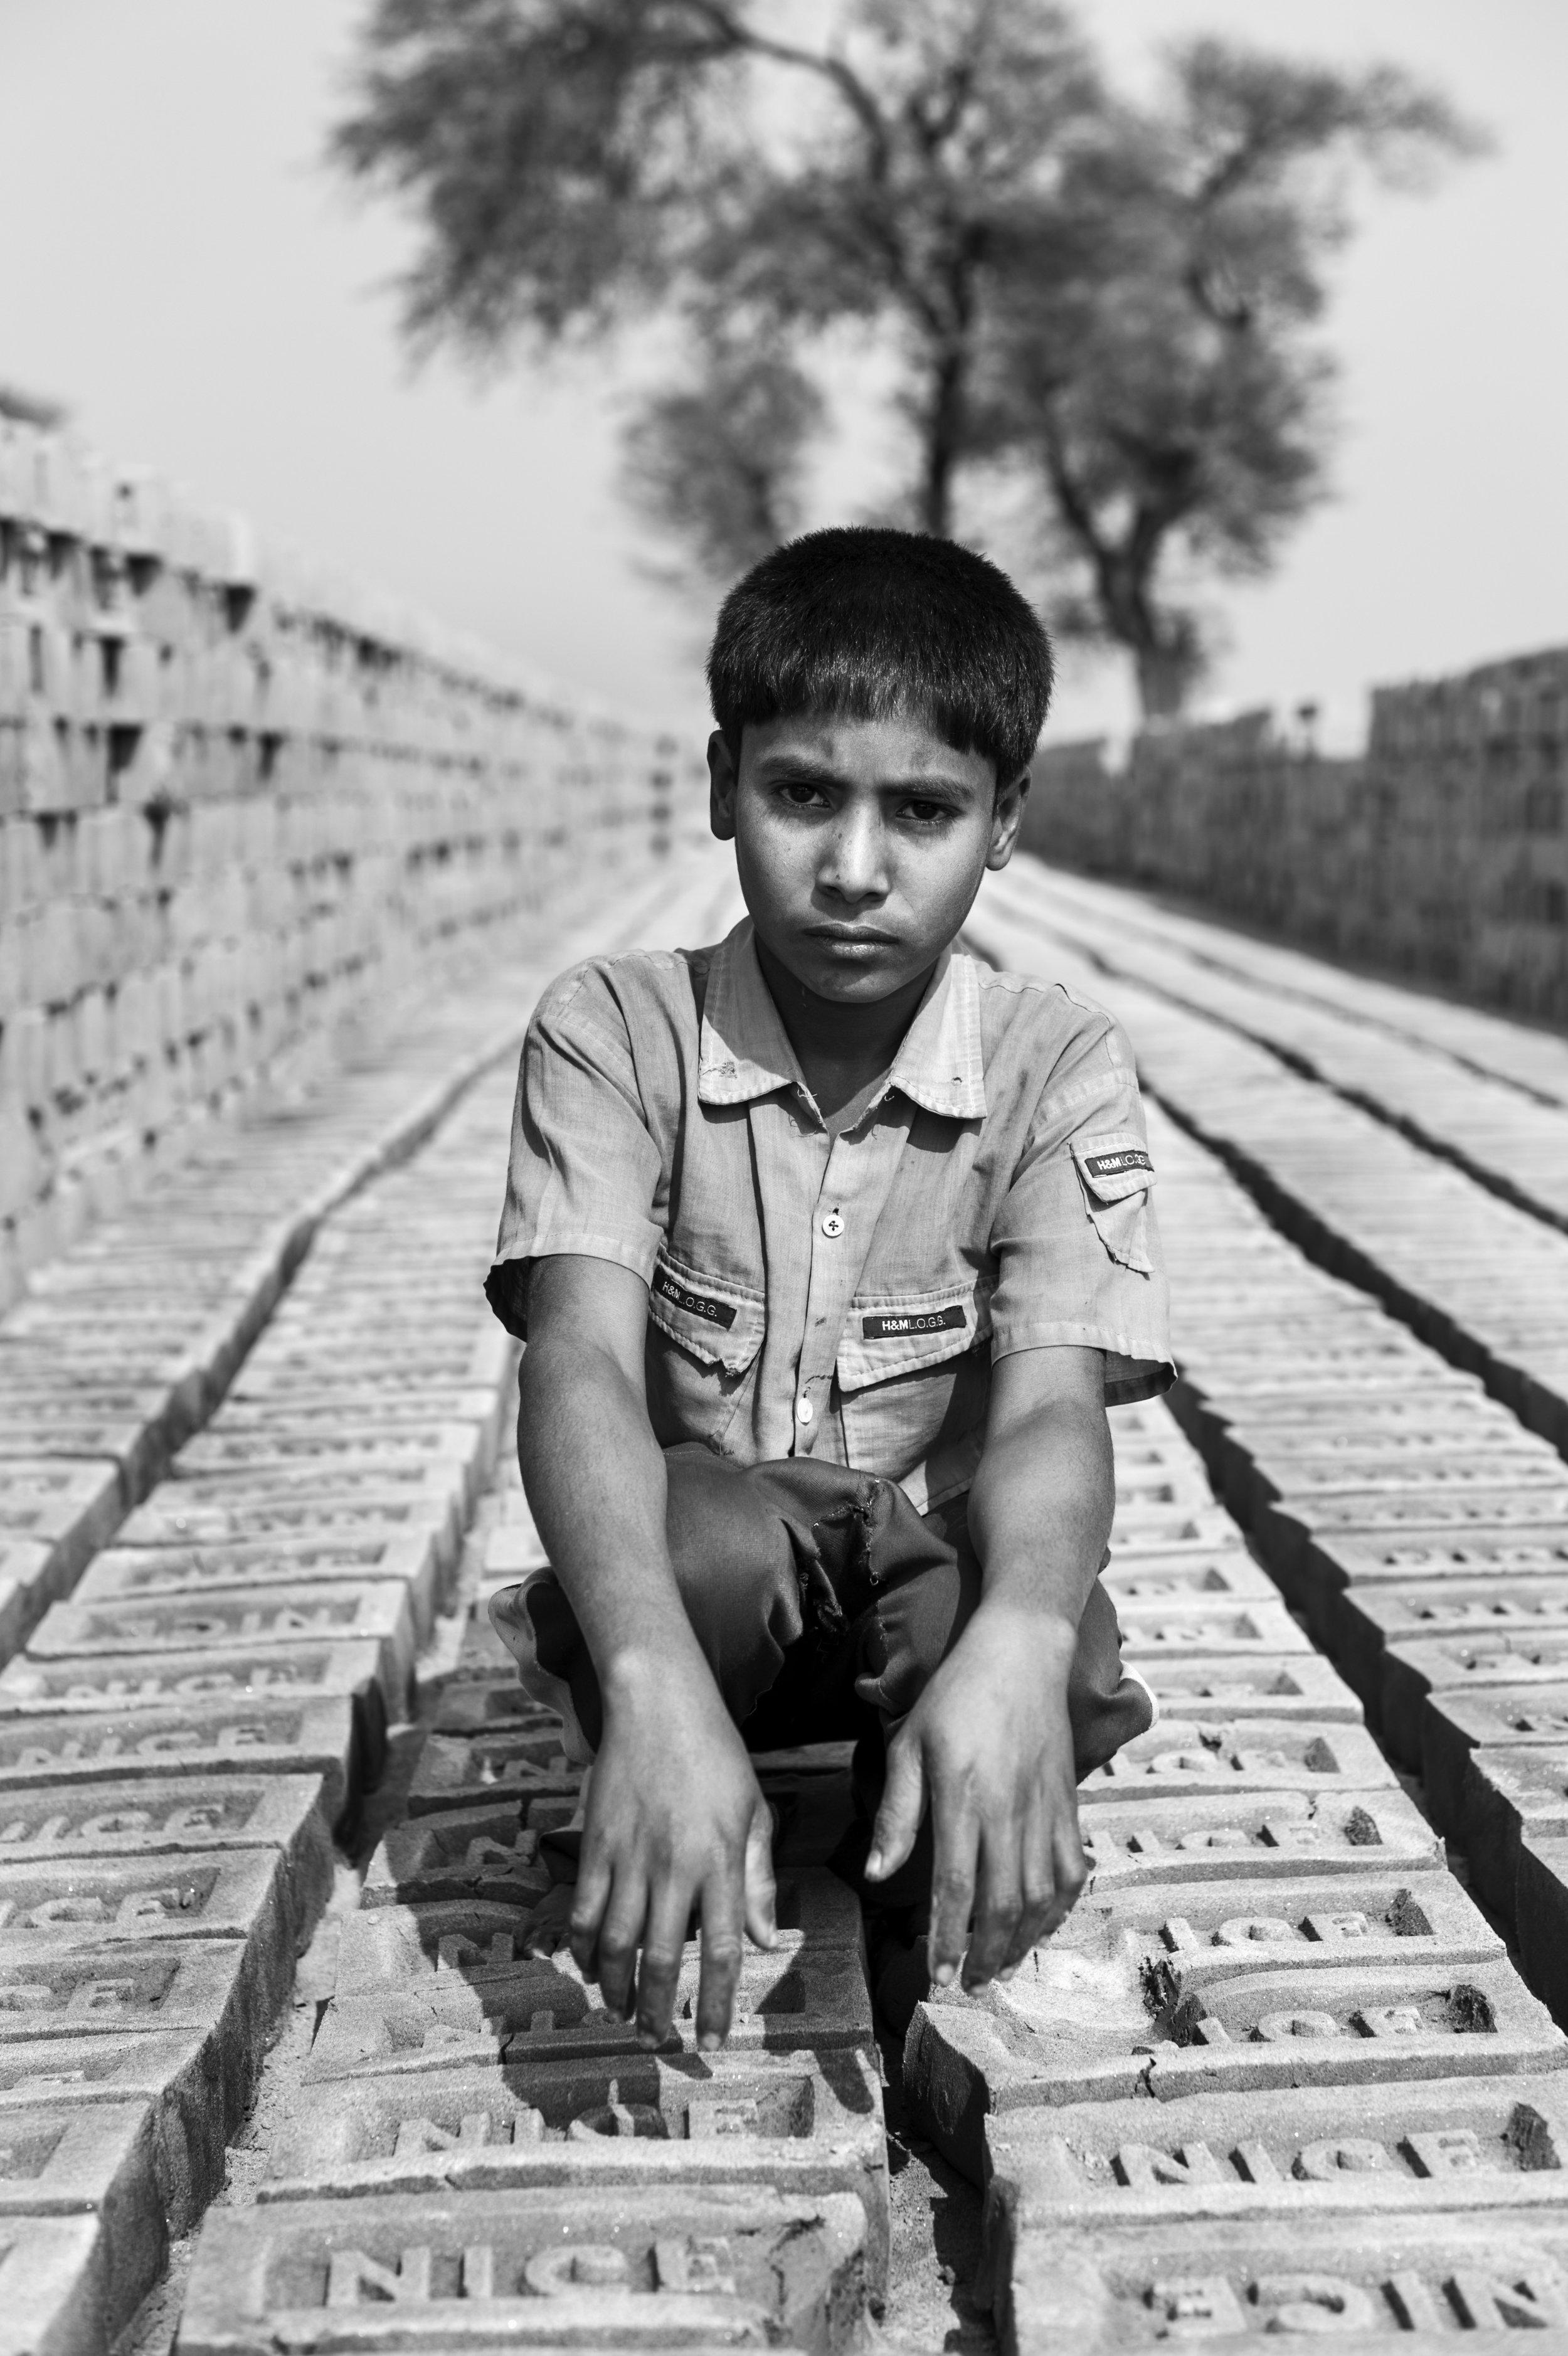 Child Labor and Exploitation in Bangladesh